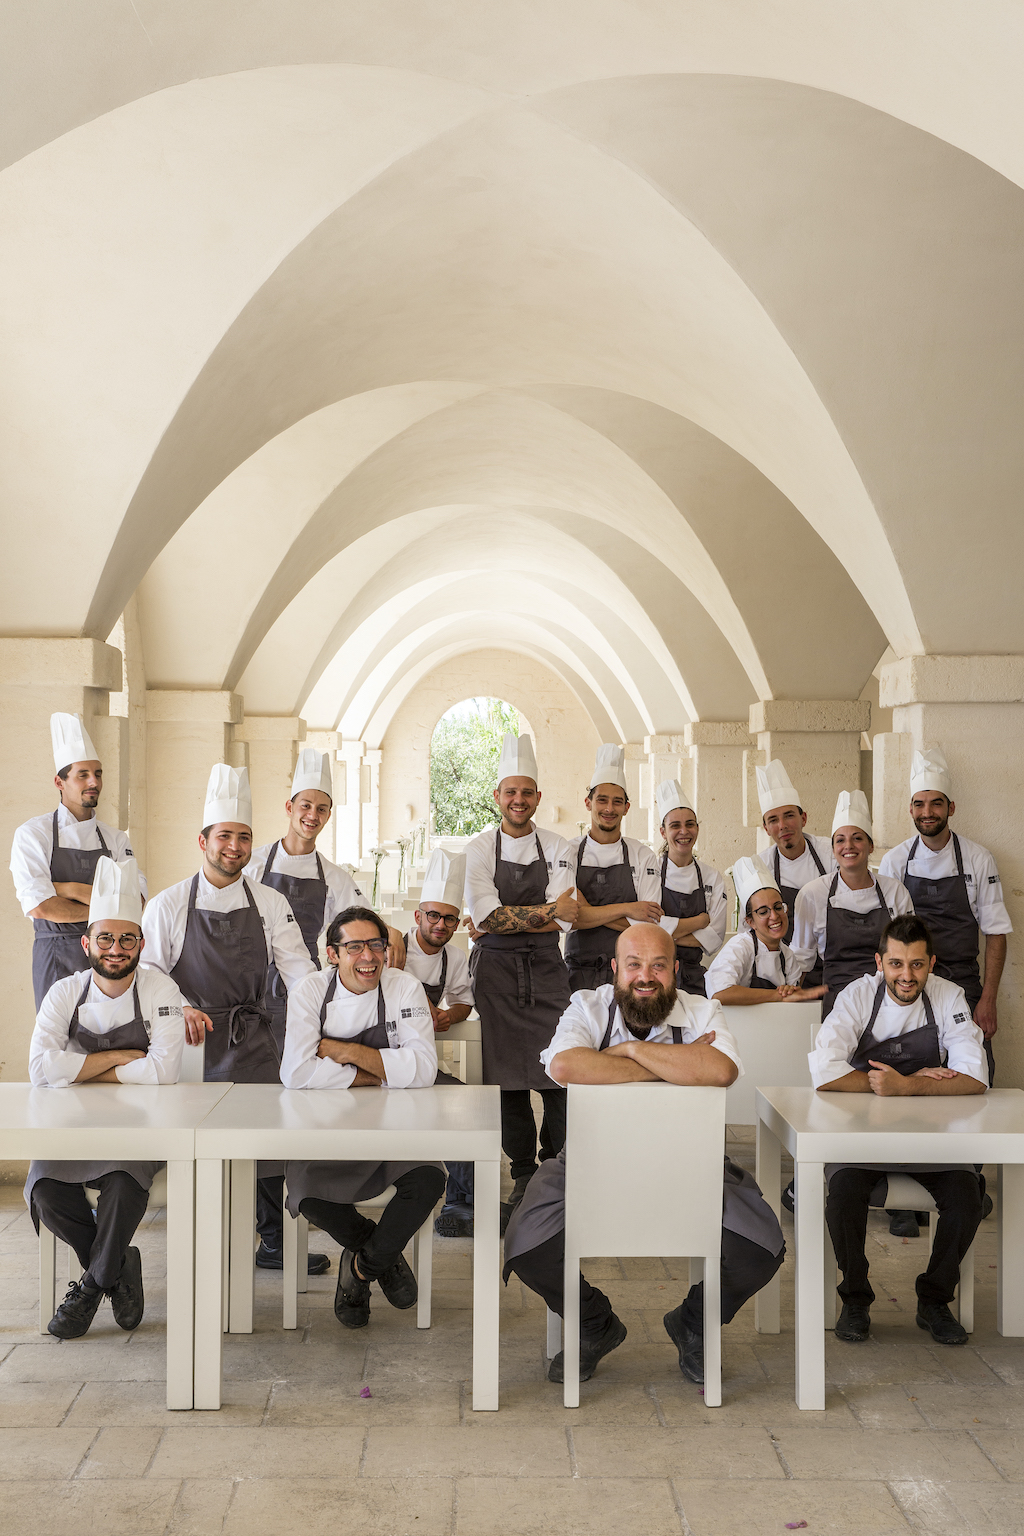 Borgo Egnazia Due Camini Menù Mediterraneo - Brigata Cucina _ Giorgio Baroni - PH Courtesy Borgo Egnazia